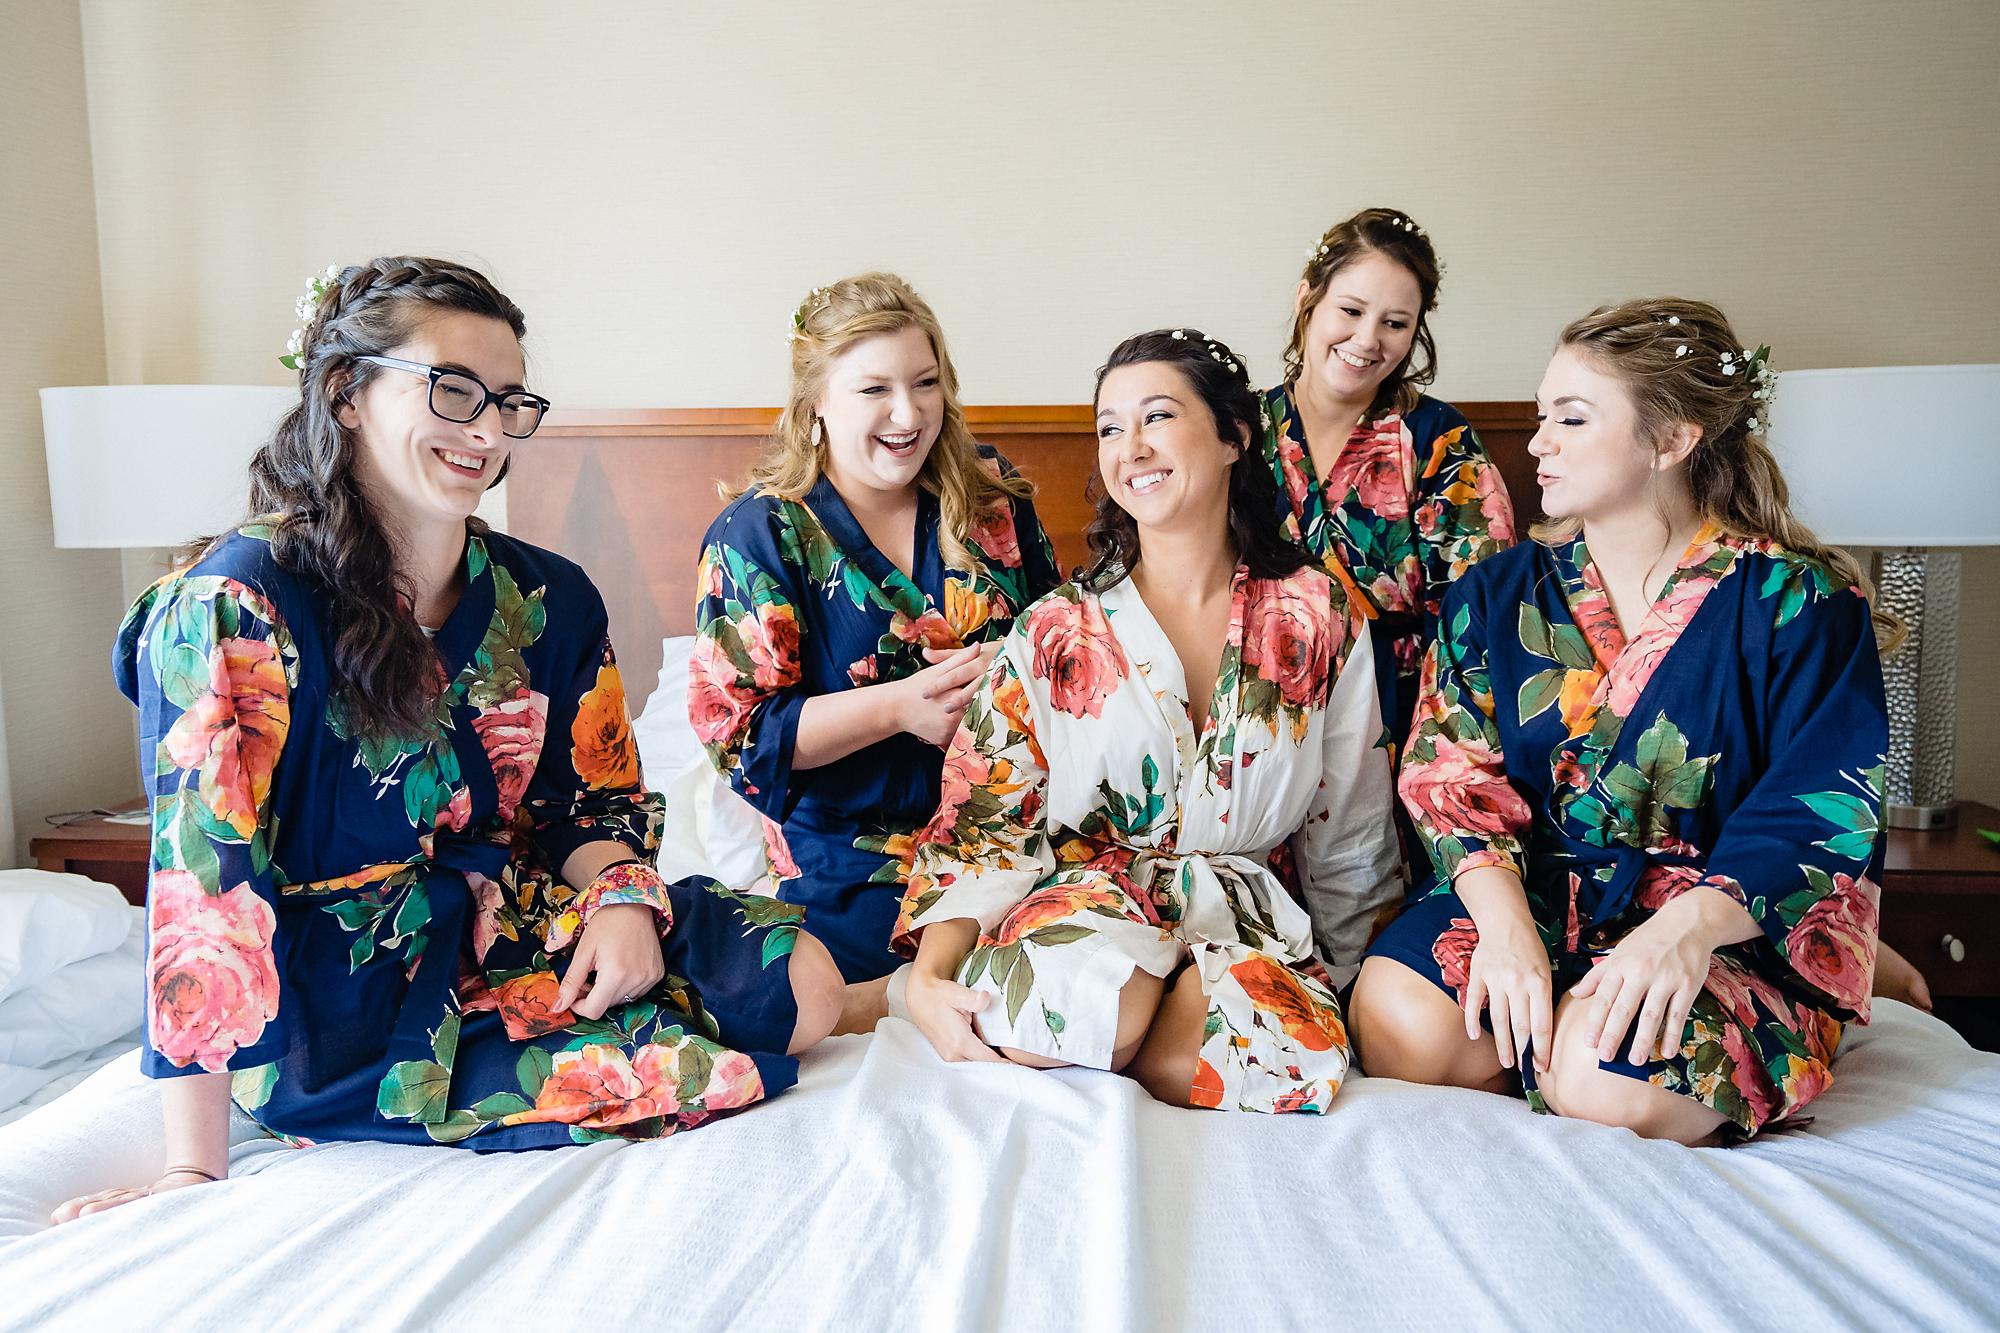 Embassy-Suites-Rivercenter-Wedding-Photography-1.jpg